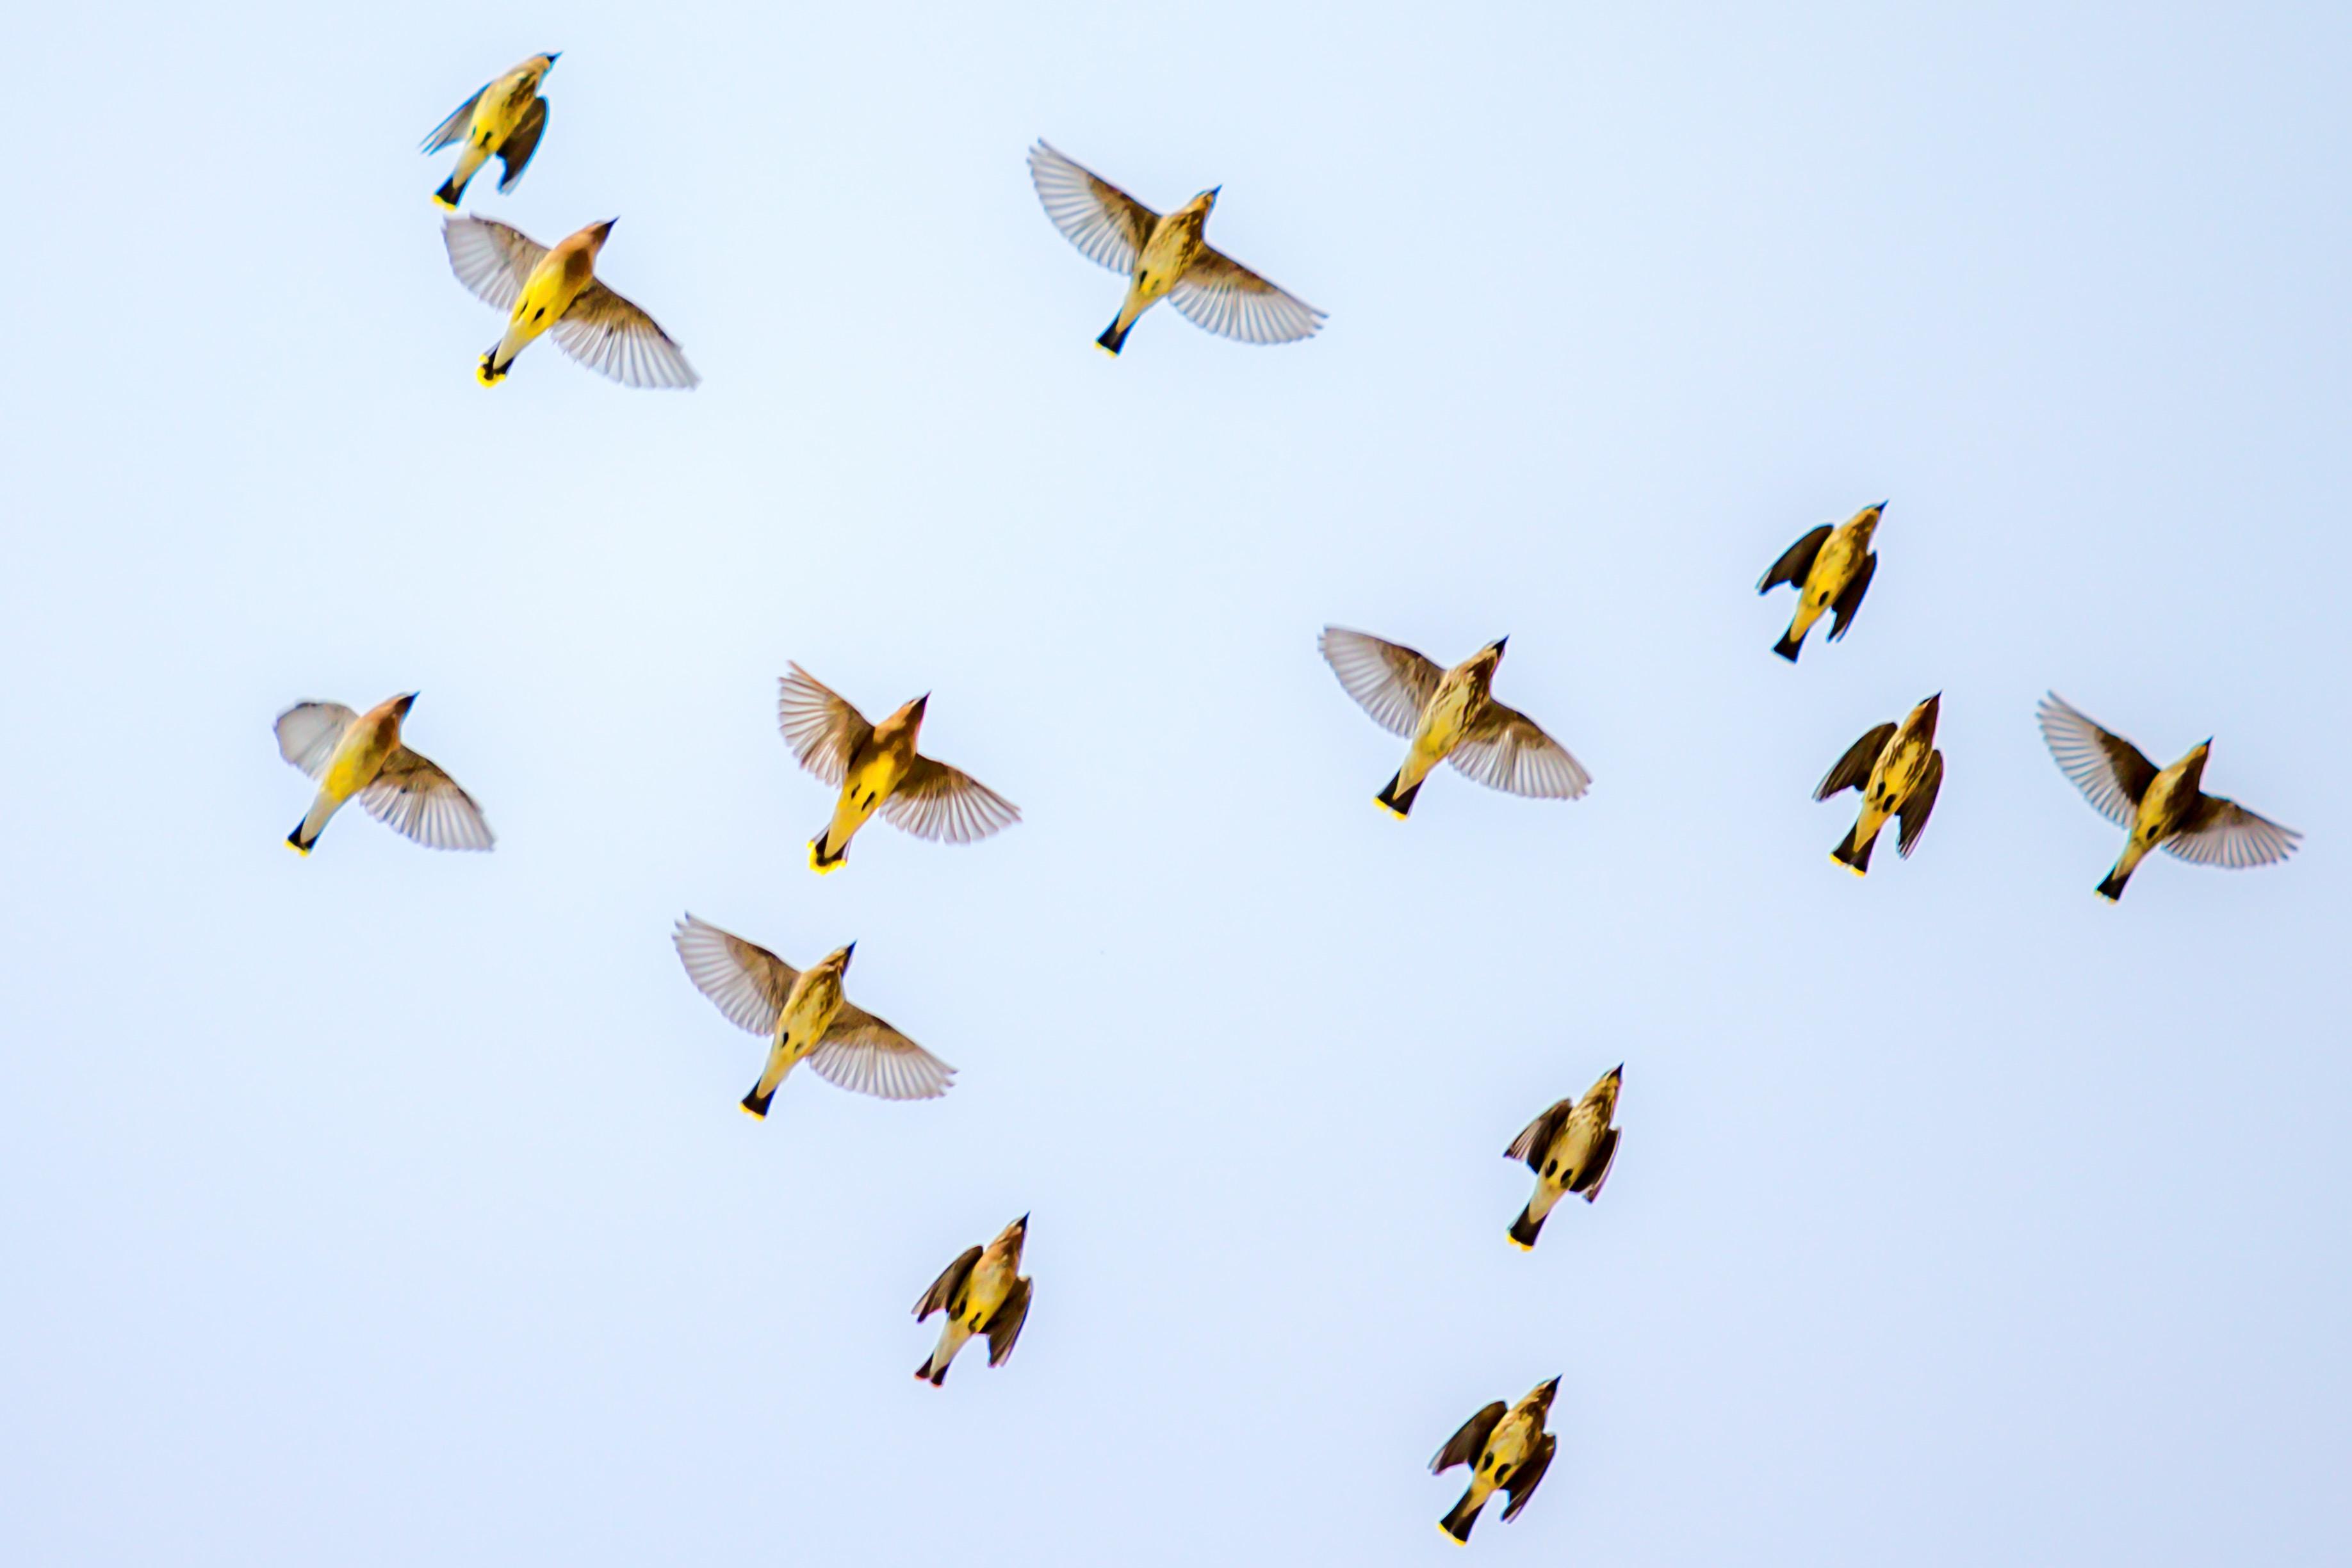 flock of birds flying on sky